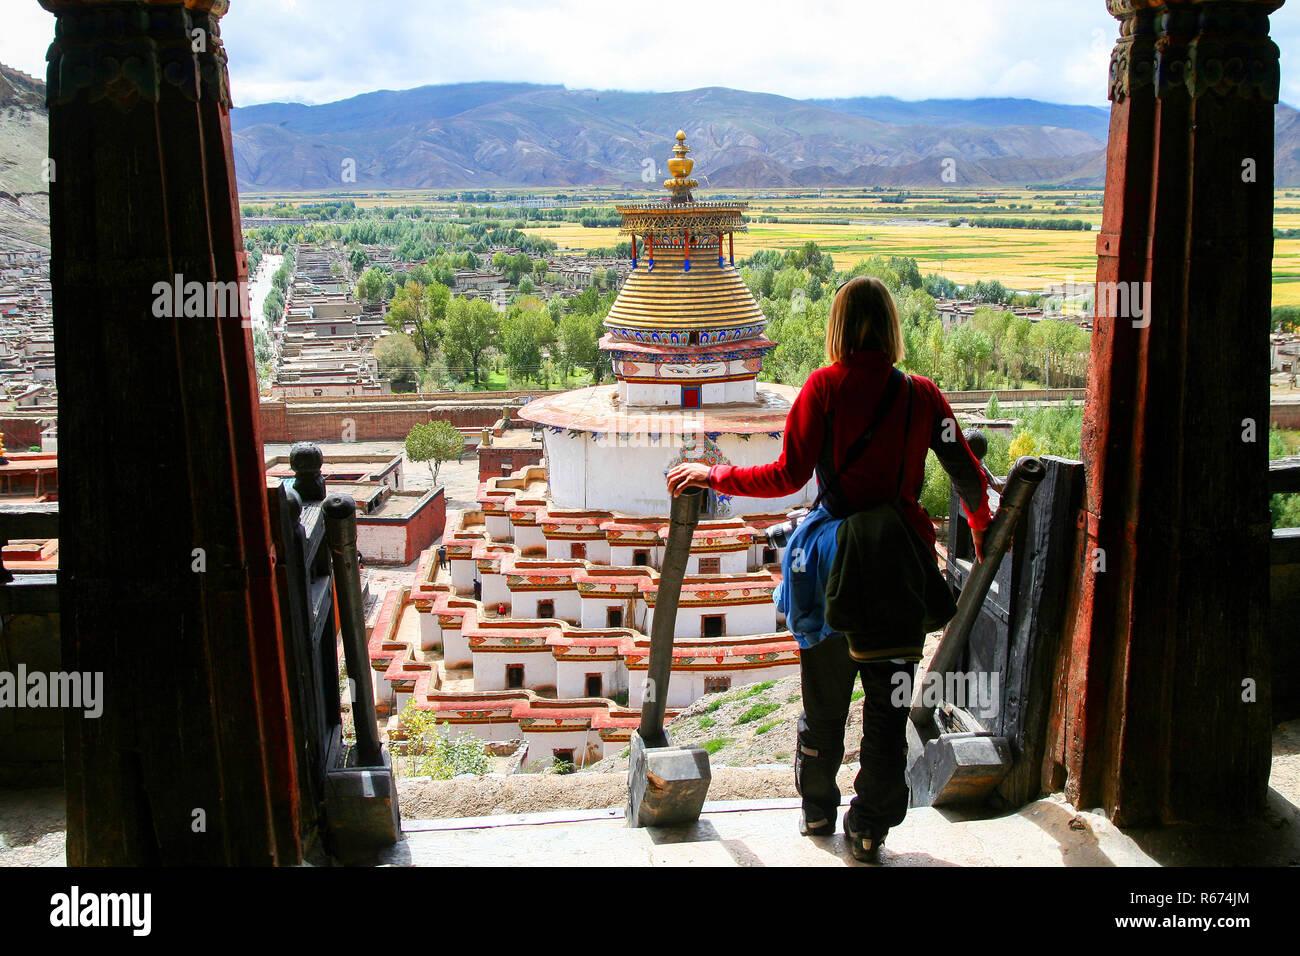 Female traveller looking at the Buddhist Kumbum chorten in Gyantse - Stock Image